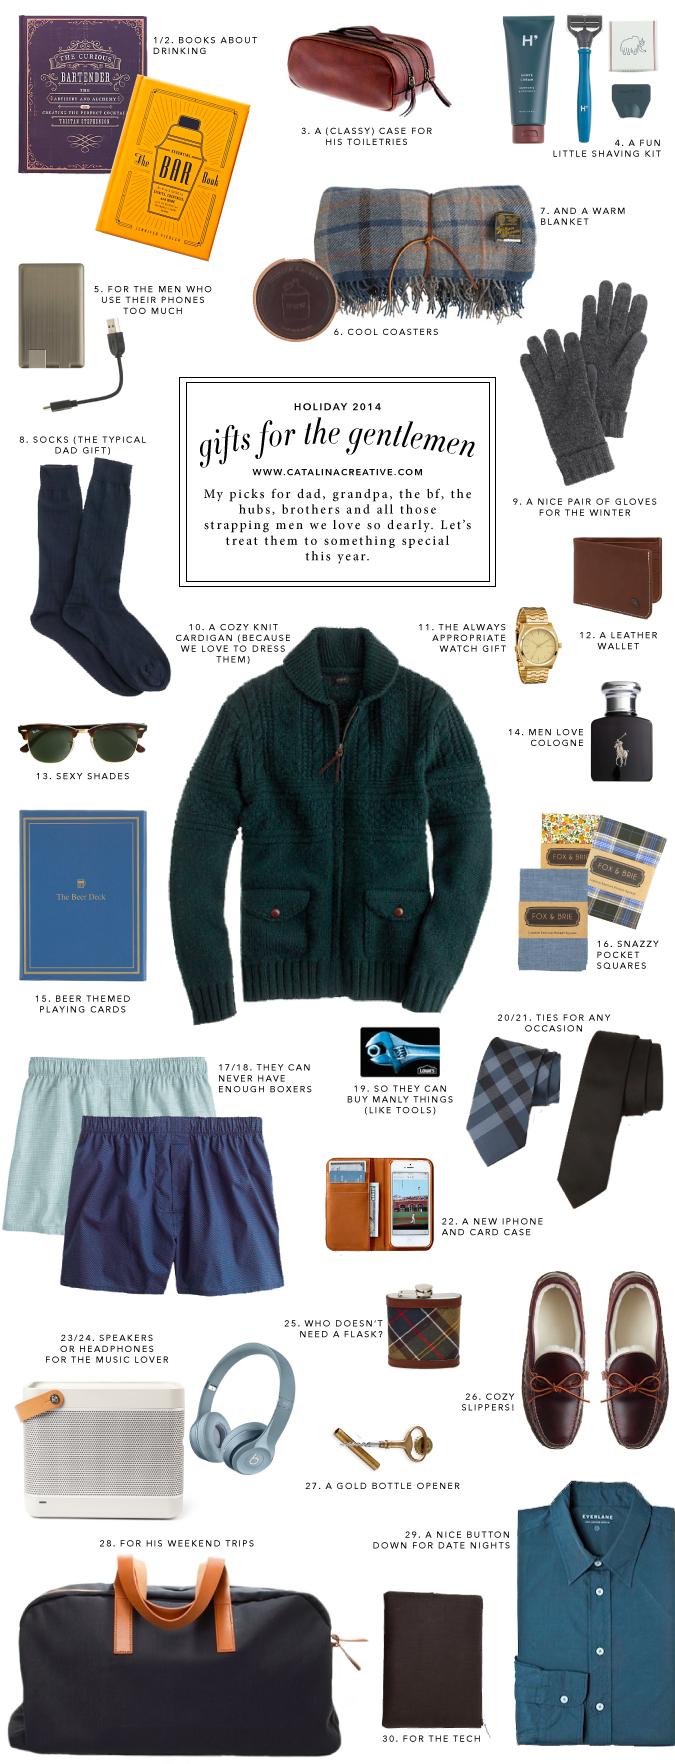 Catalina Creative Holiday 2014 Gift Guide - Gentlemen